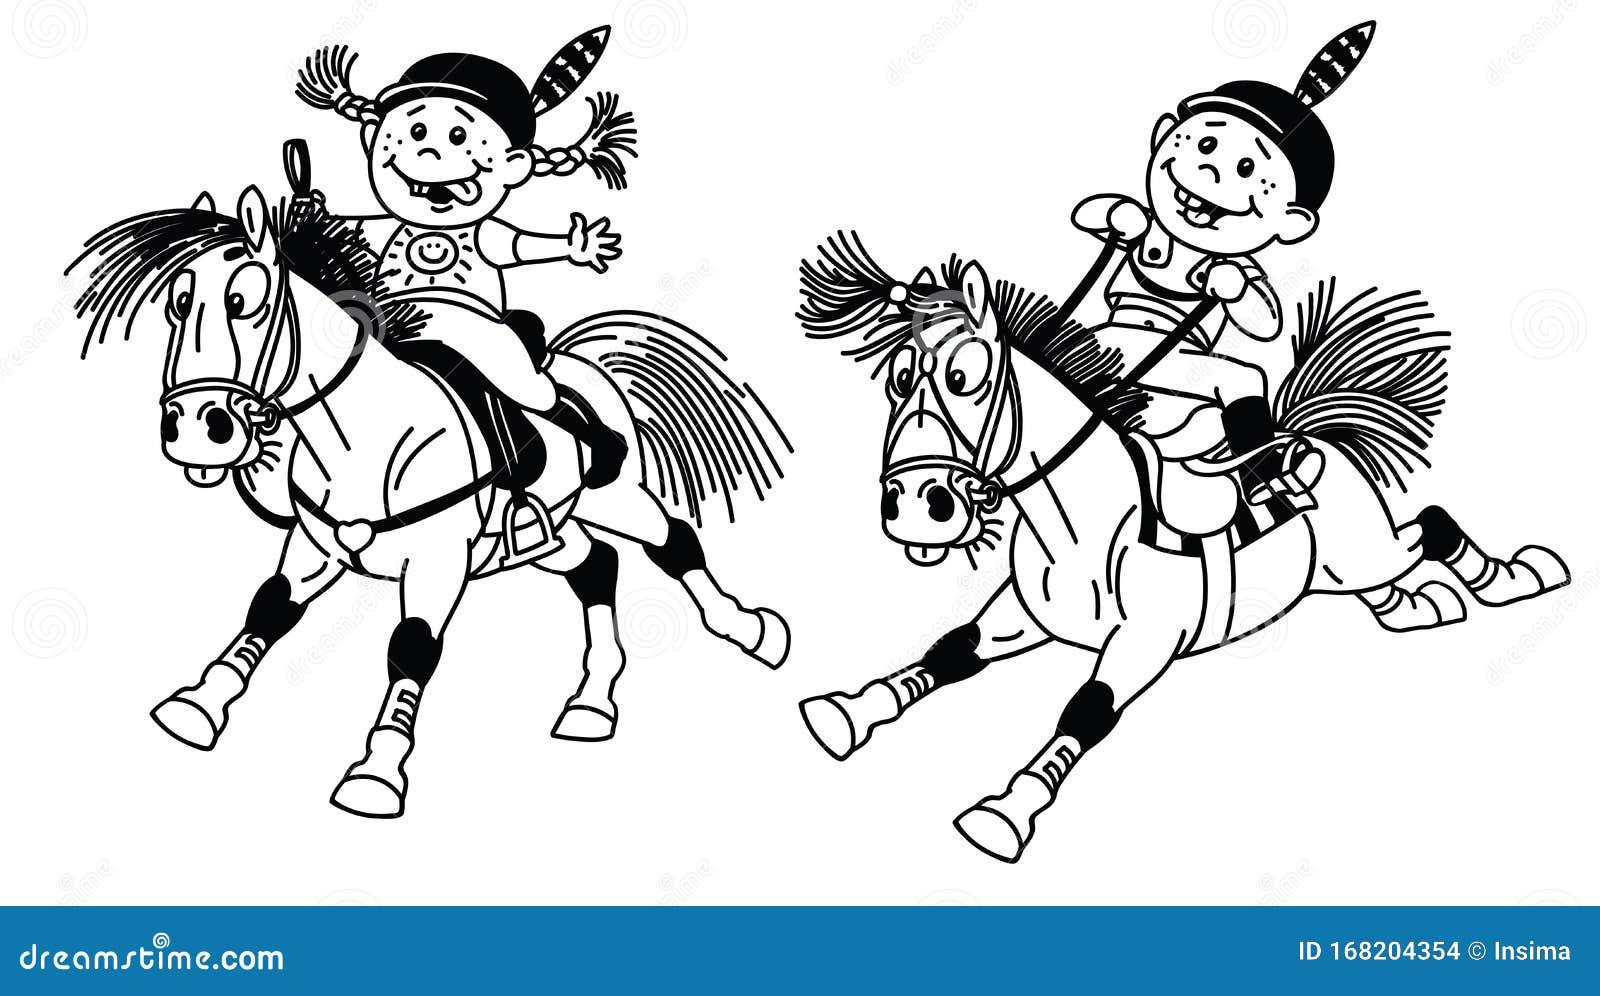 Cartoon Little Girl Riding Pony Horse Stock Illustrations 98 Cartoon Little Girl Riding Pony Horse Stock Illustrations Vectors Clipart Dreamstime